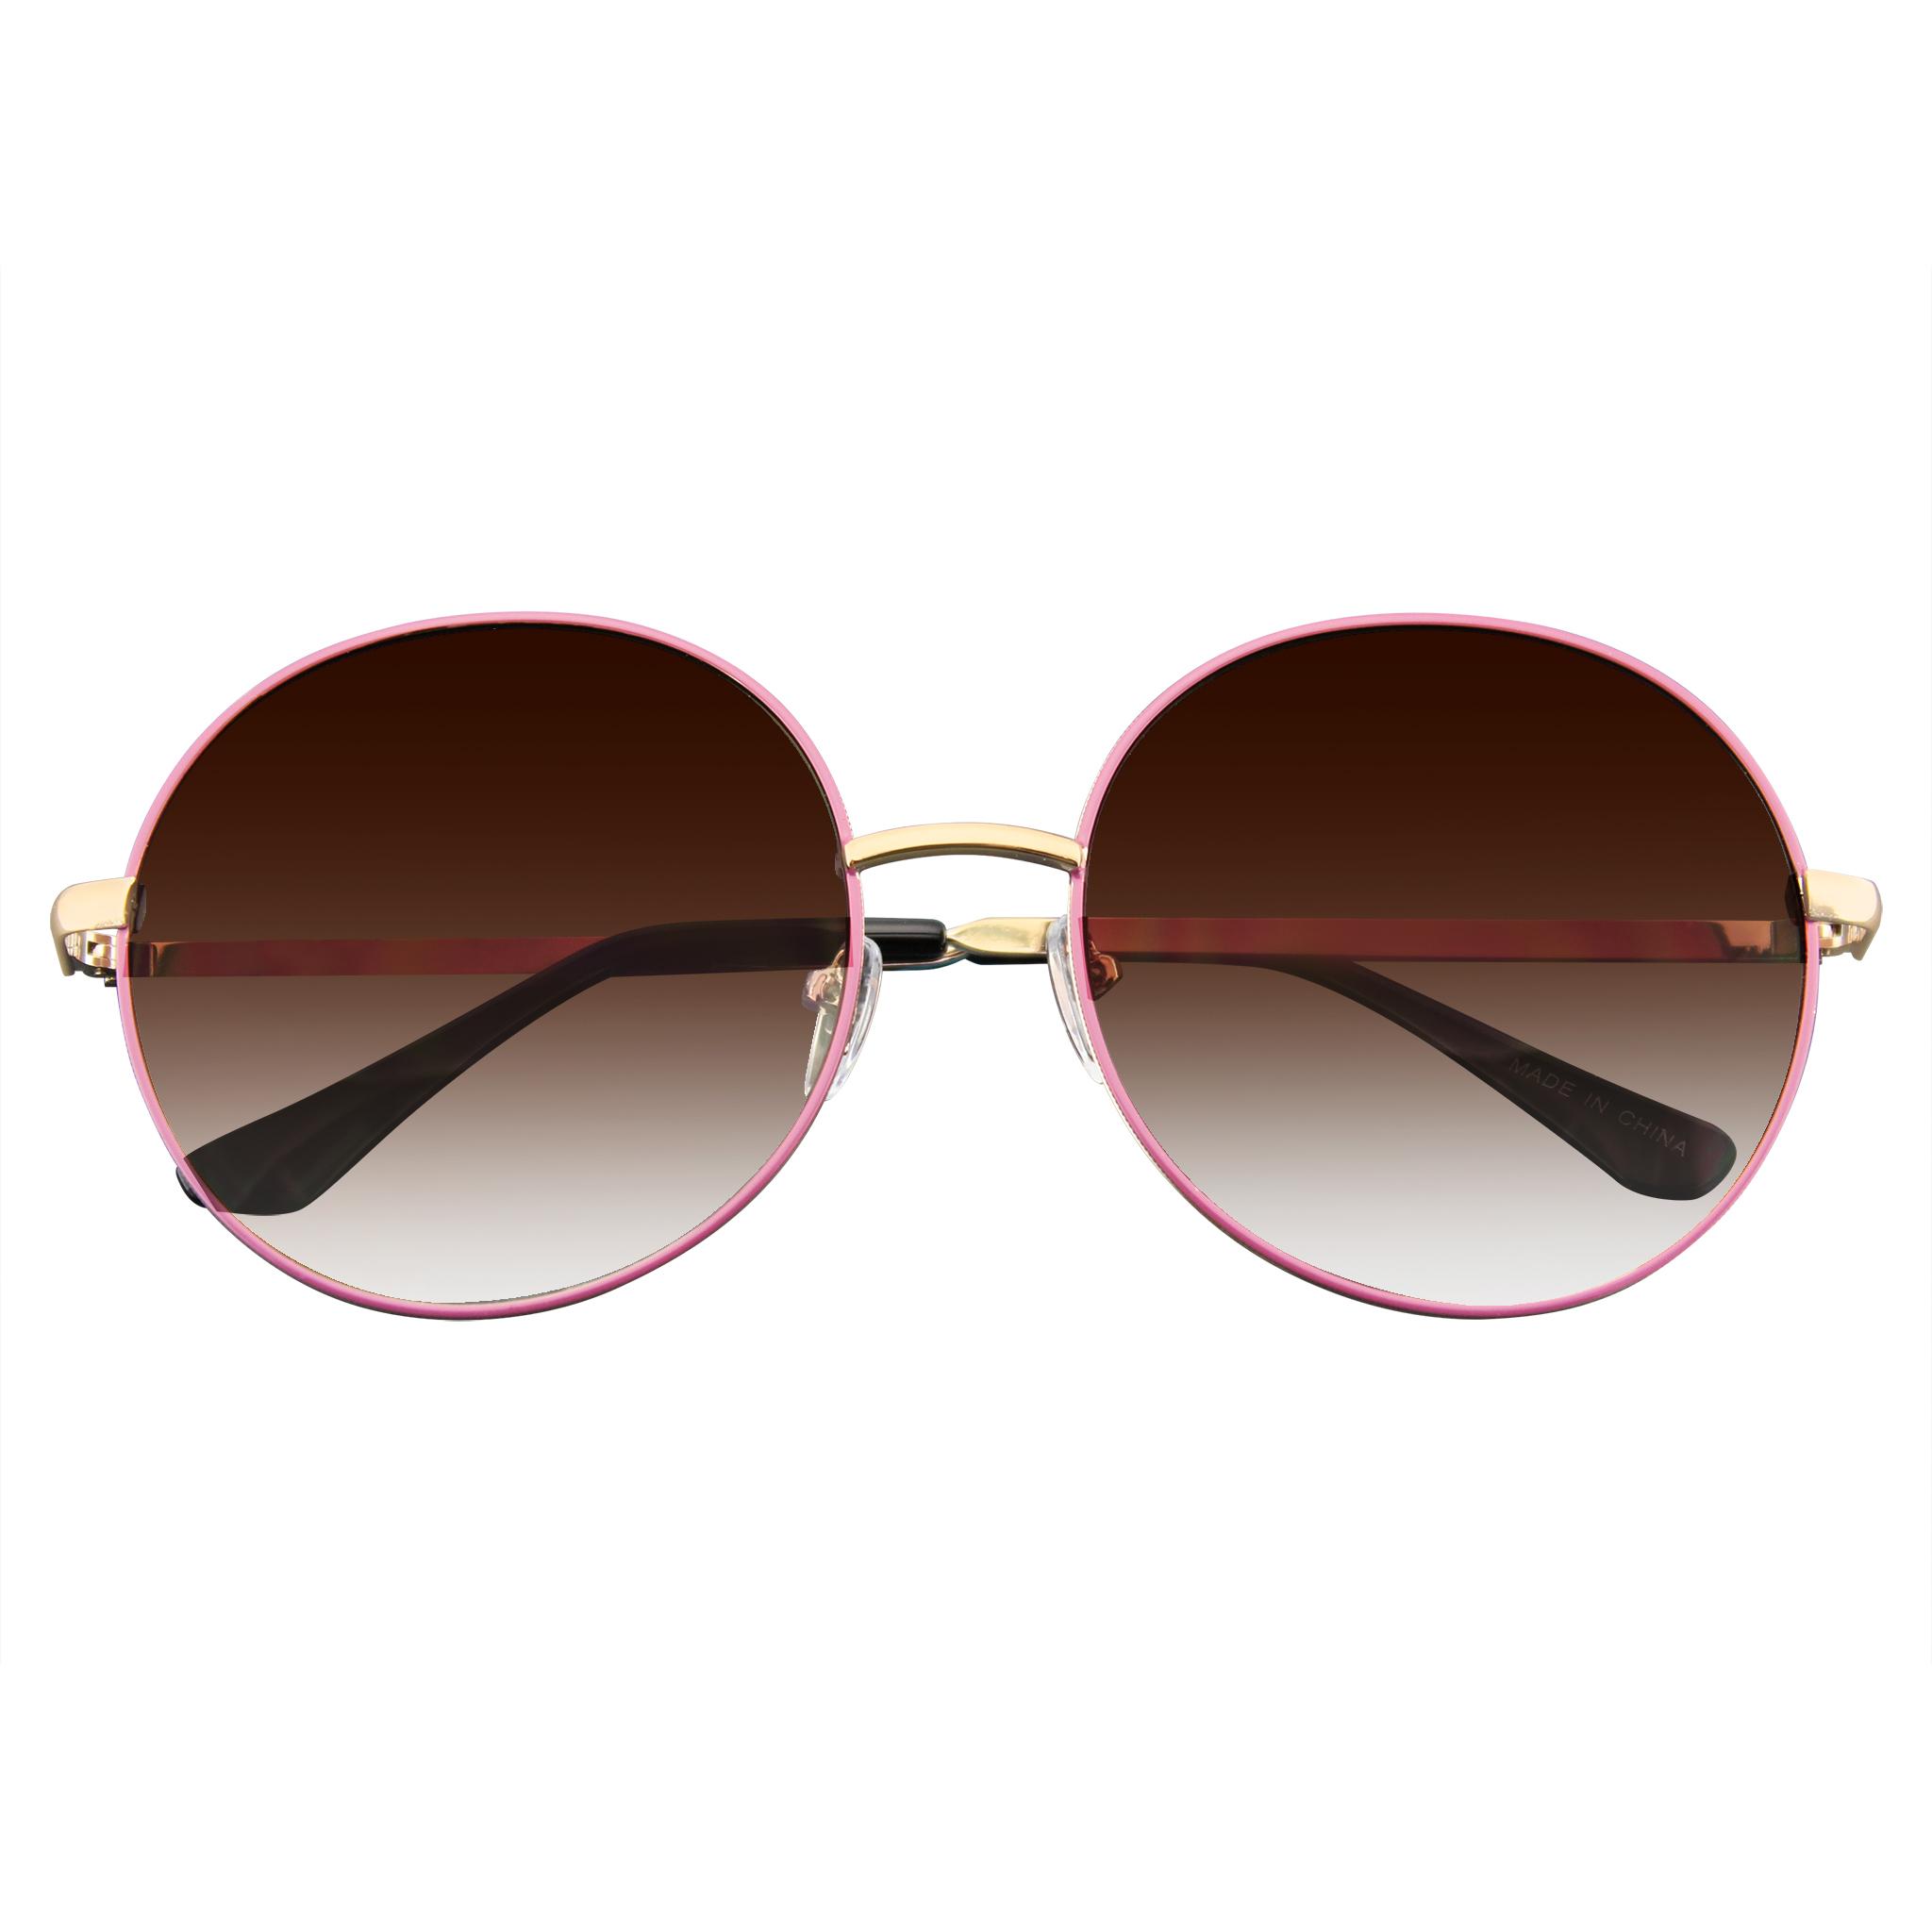 ec25b6936468 Emblem Eyewear - Women's Super Round Oversize Fashion Metal Large Sunglasses